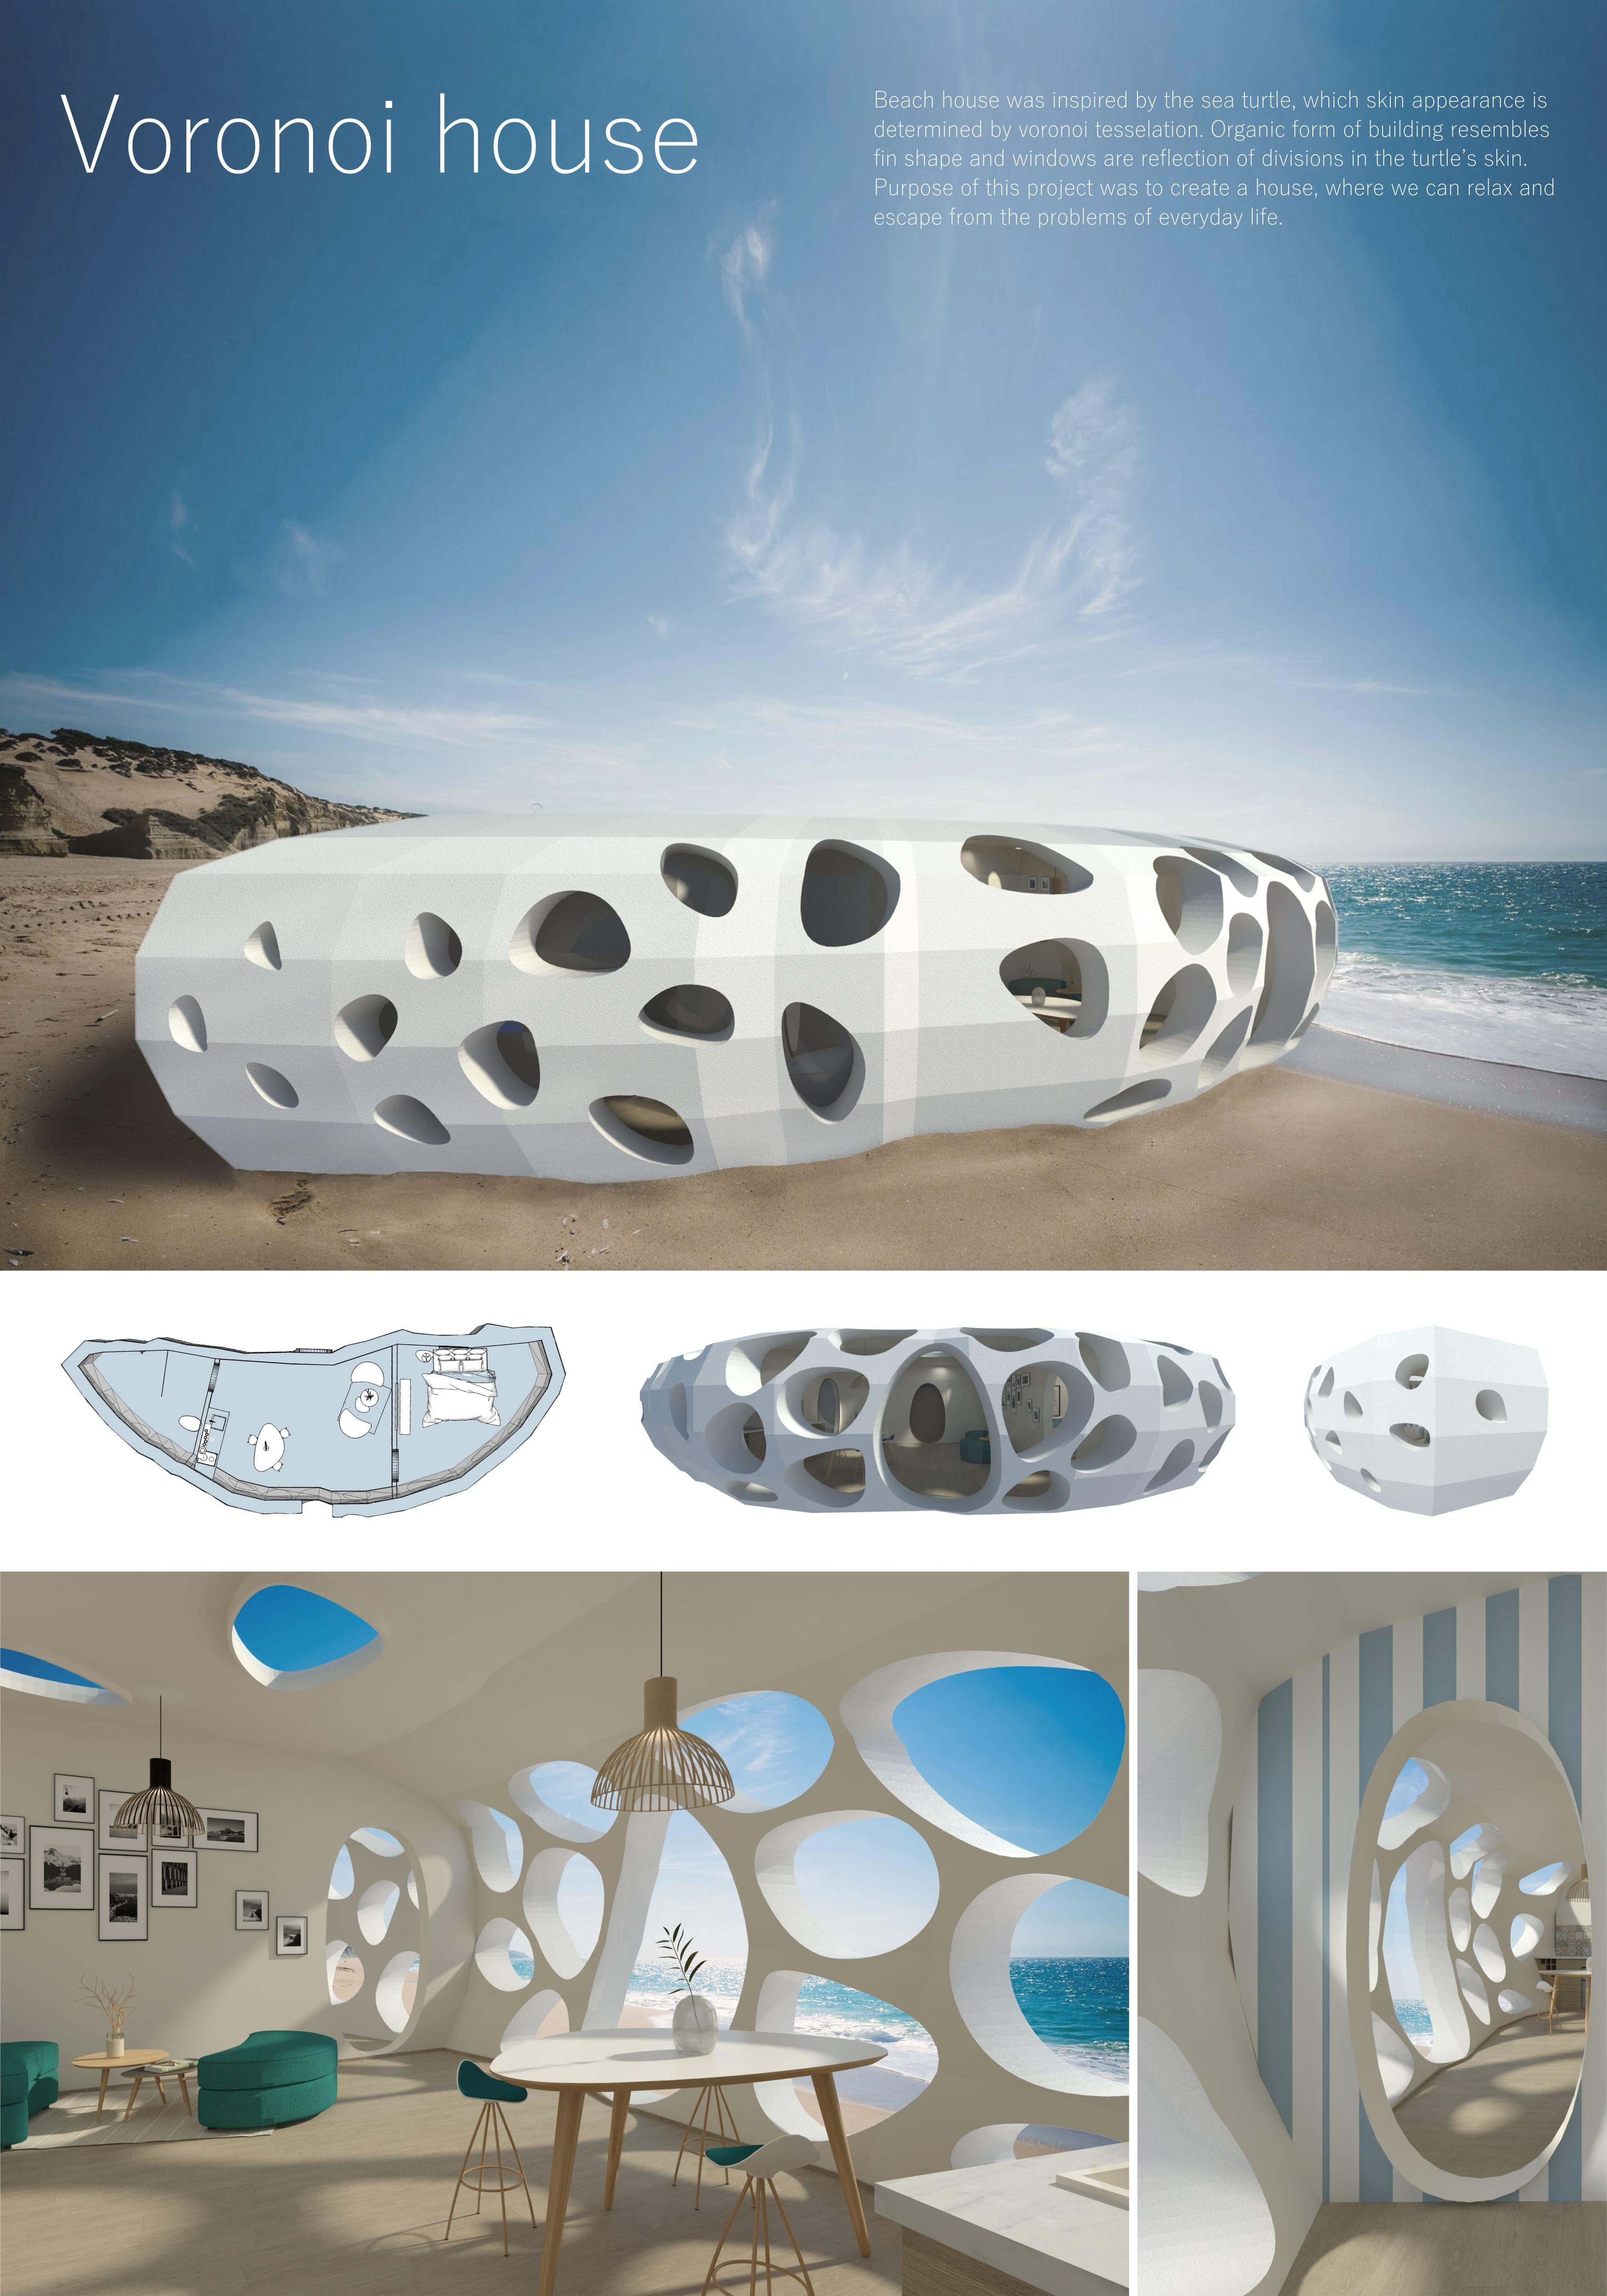 Voronoi house by Weronika Kempińska - Creative Work